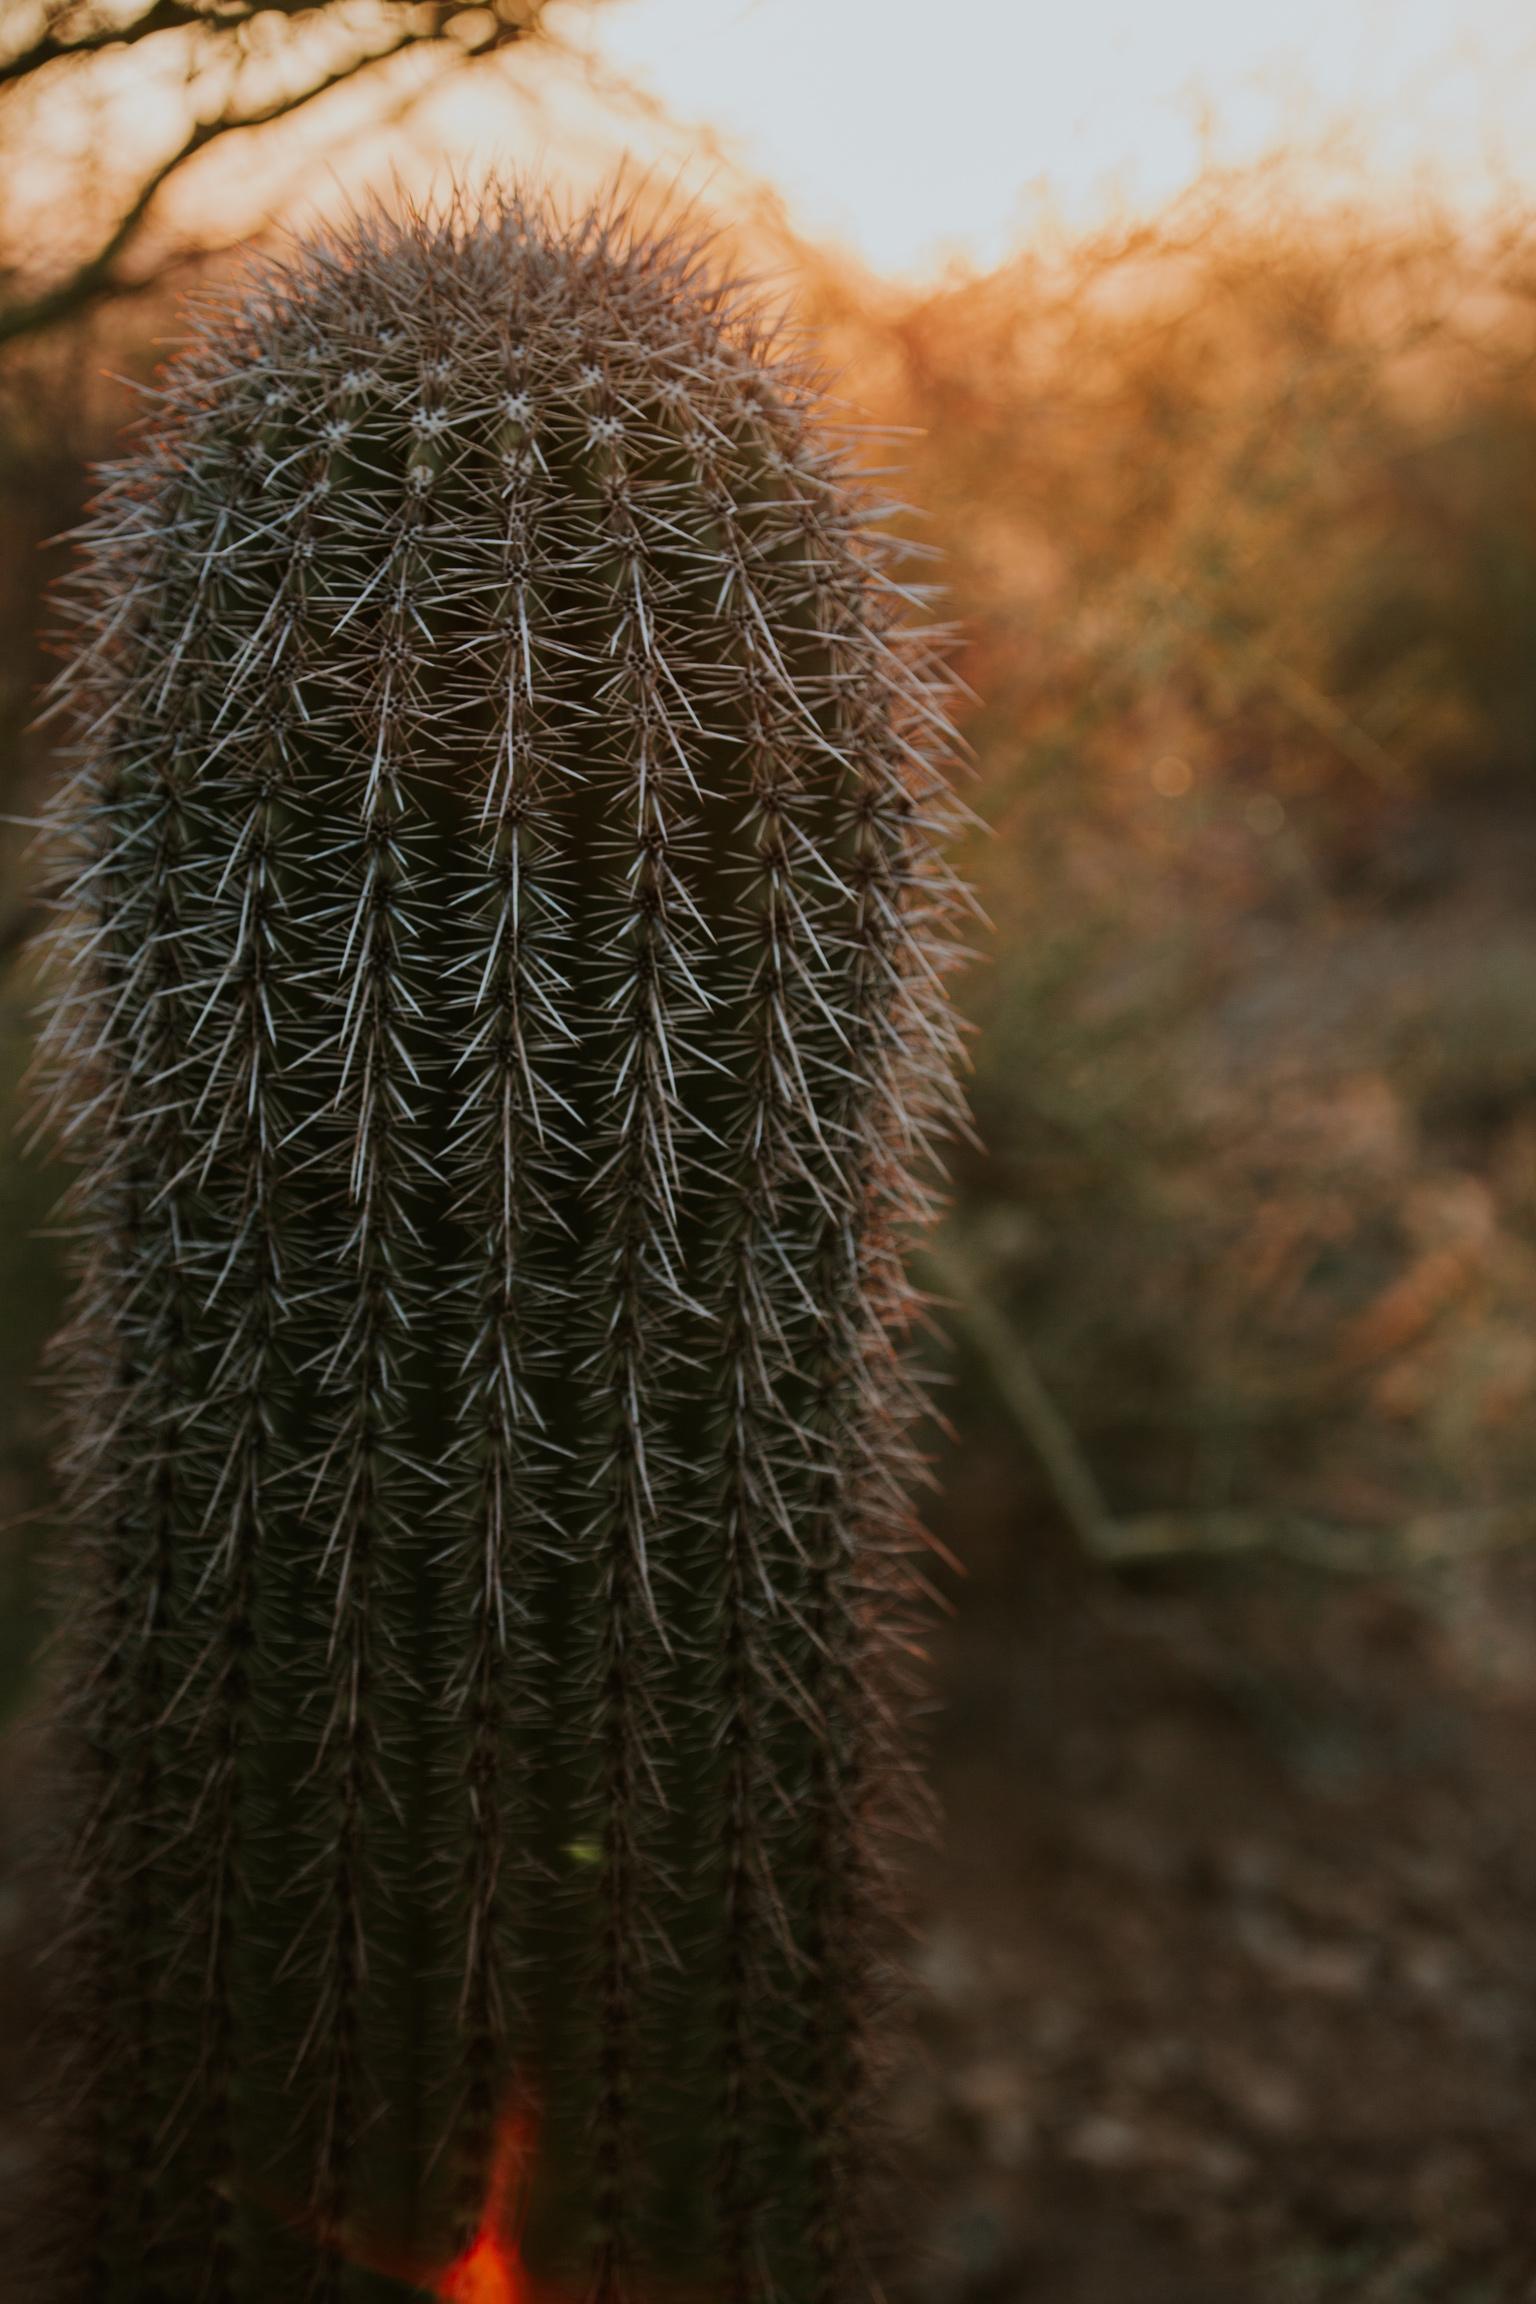 CindyGiovagnoli_Tucson_Arizona_Saguaro_National_Park_cactus_sunset_blooming_spring_sunset_petroglyphs_Native_American_indigenous-015.jpg